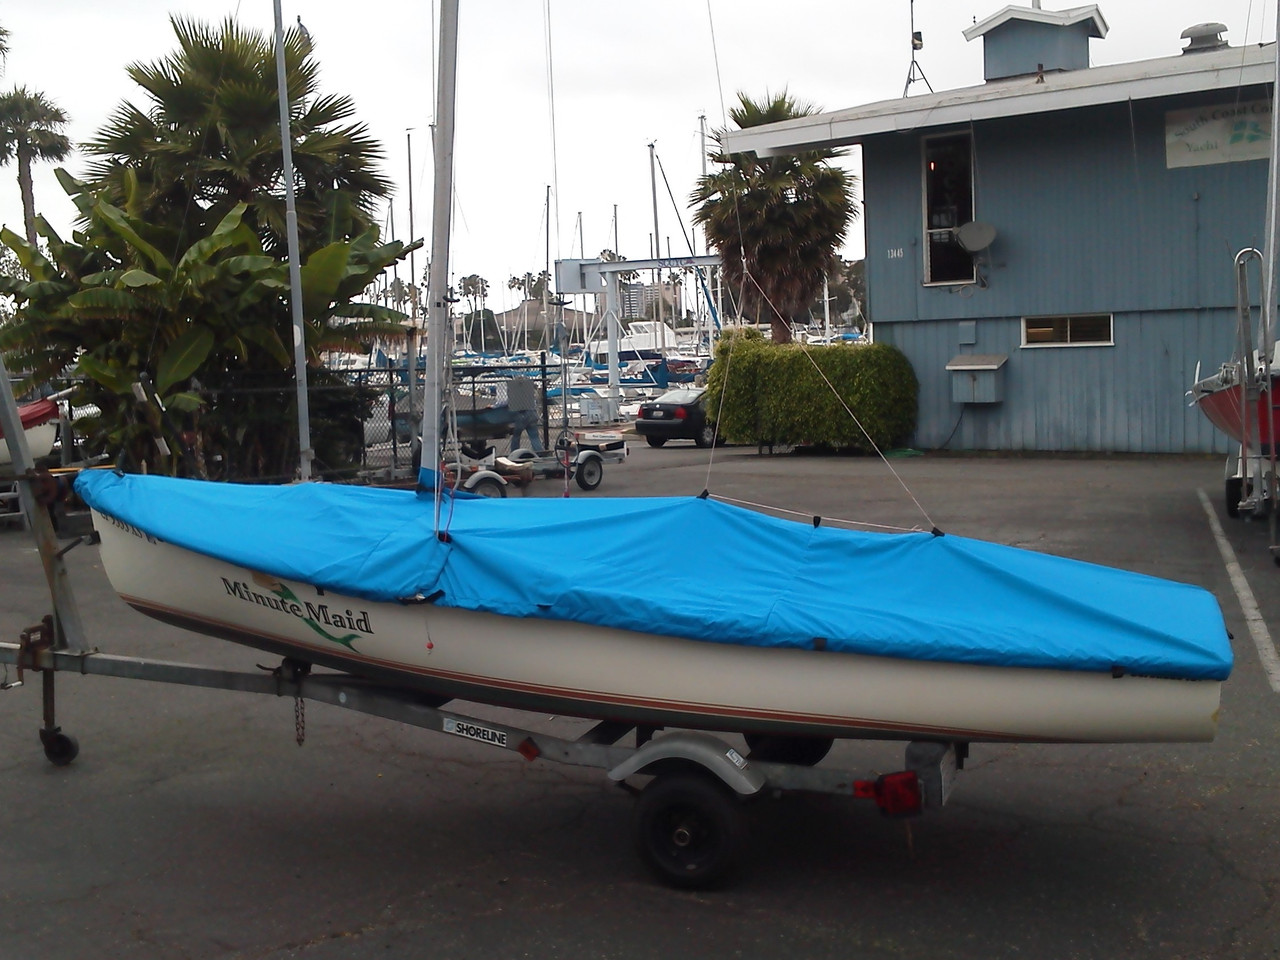 Coronado 15 Mast Up Flat Cover by SLO Sail and Canvas